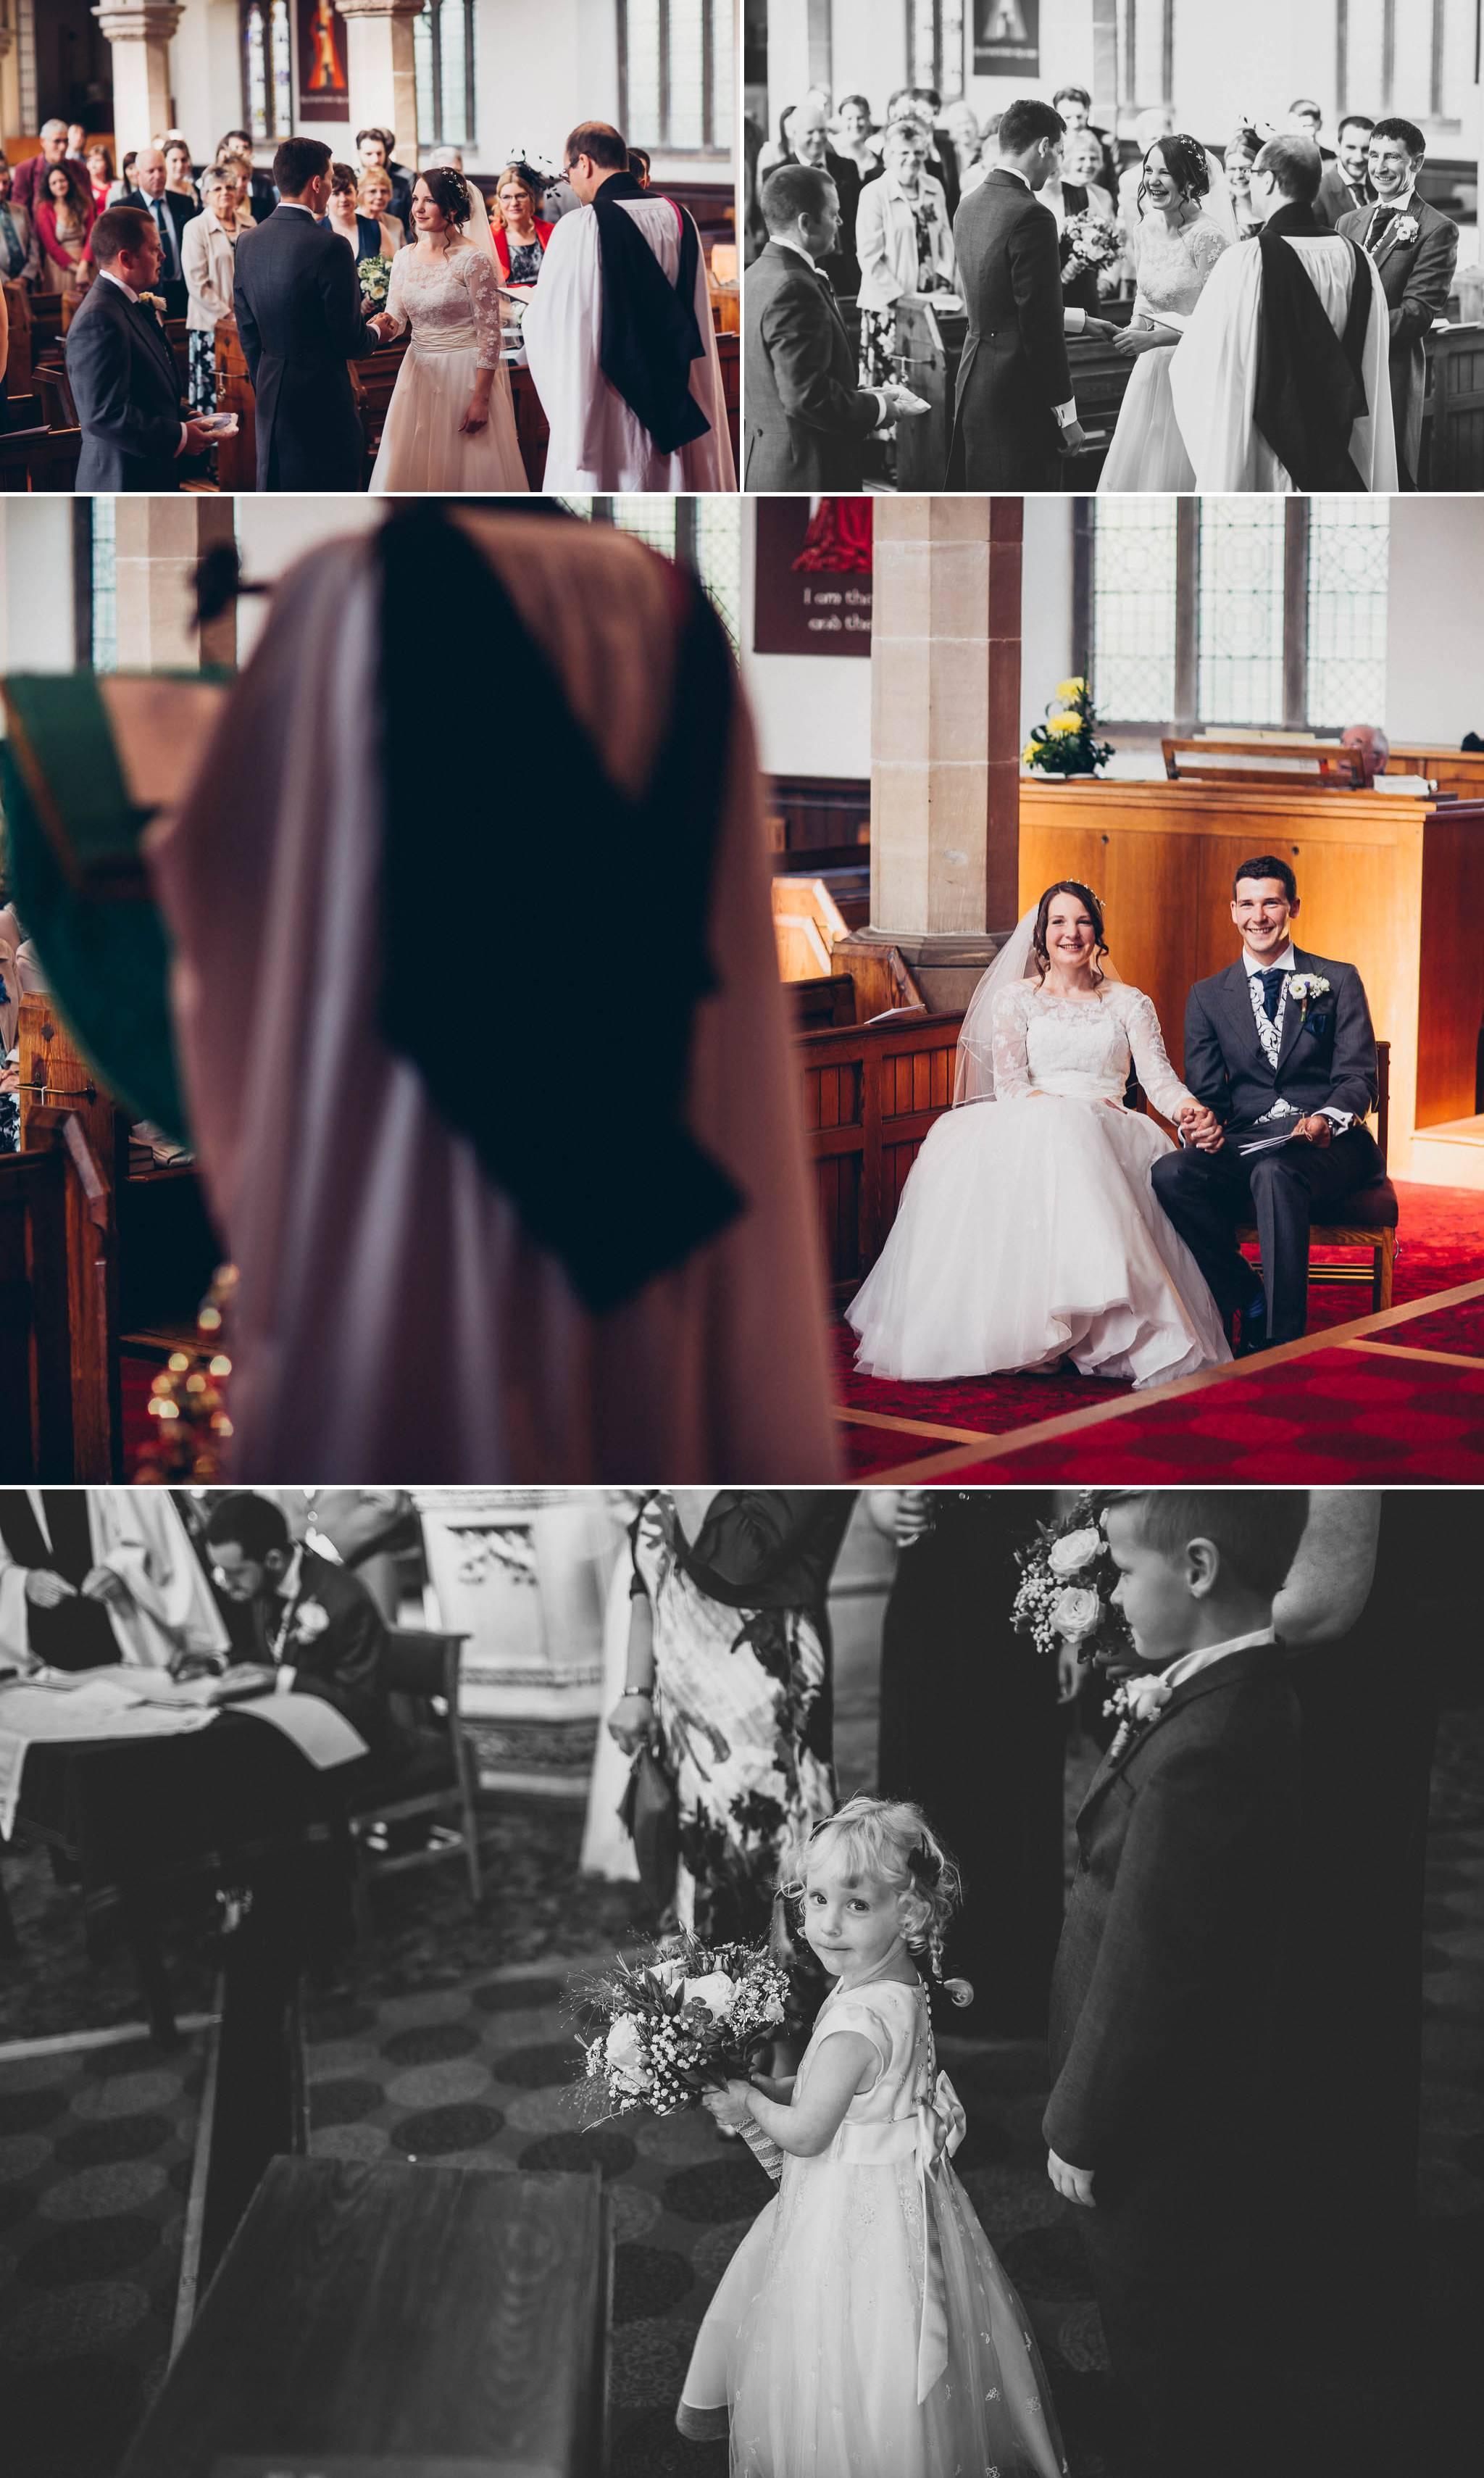 goldstone-hall-wedding-photography 9.jpg